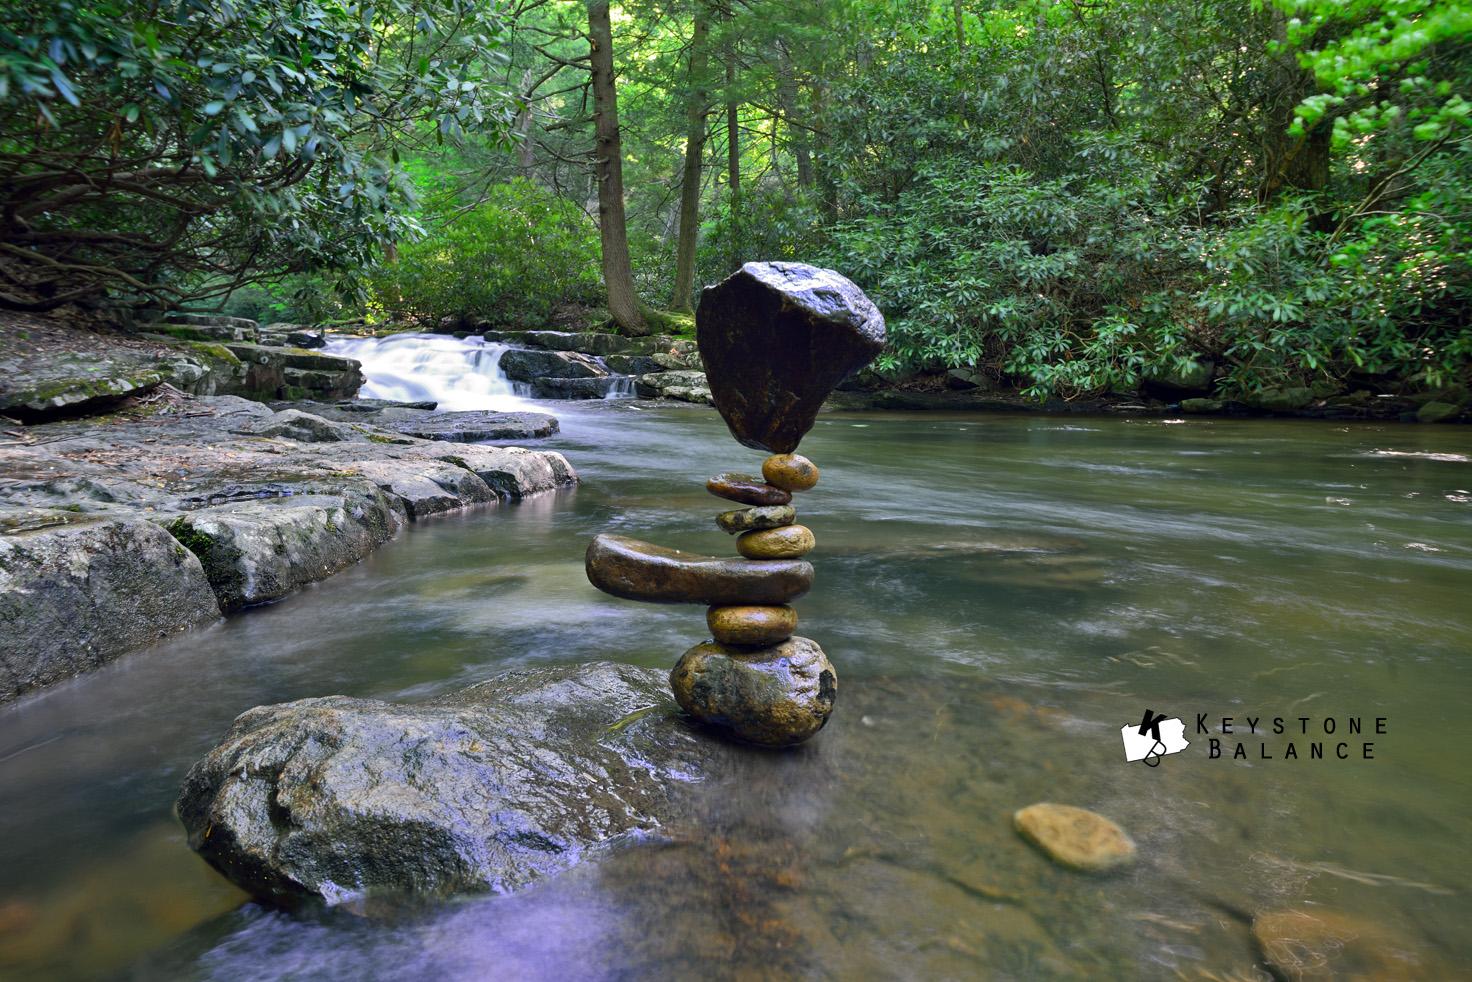 KeyStone Balance